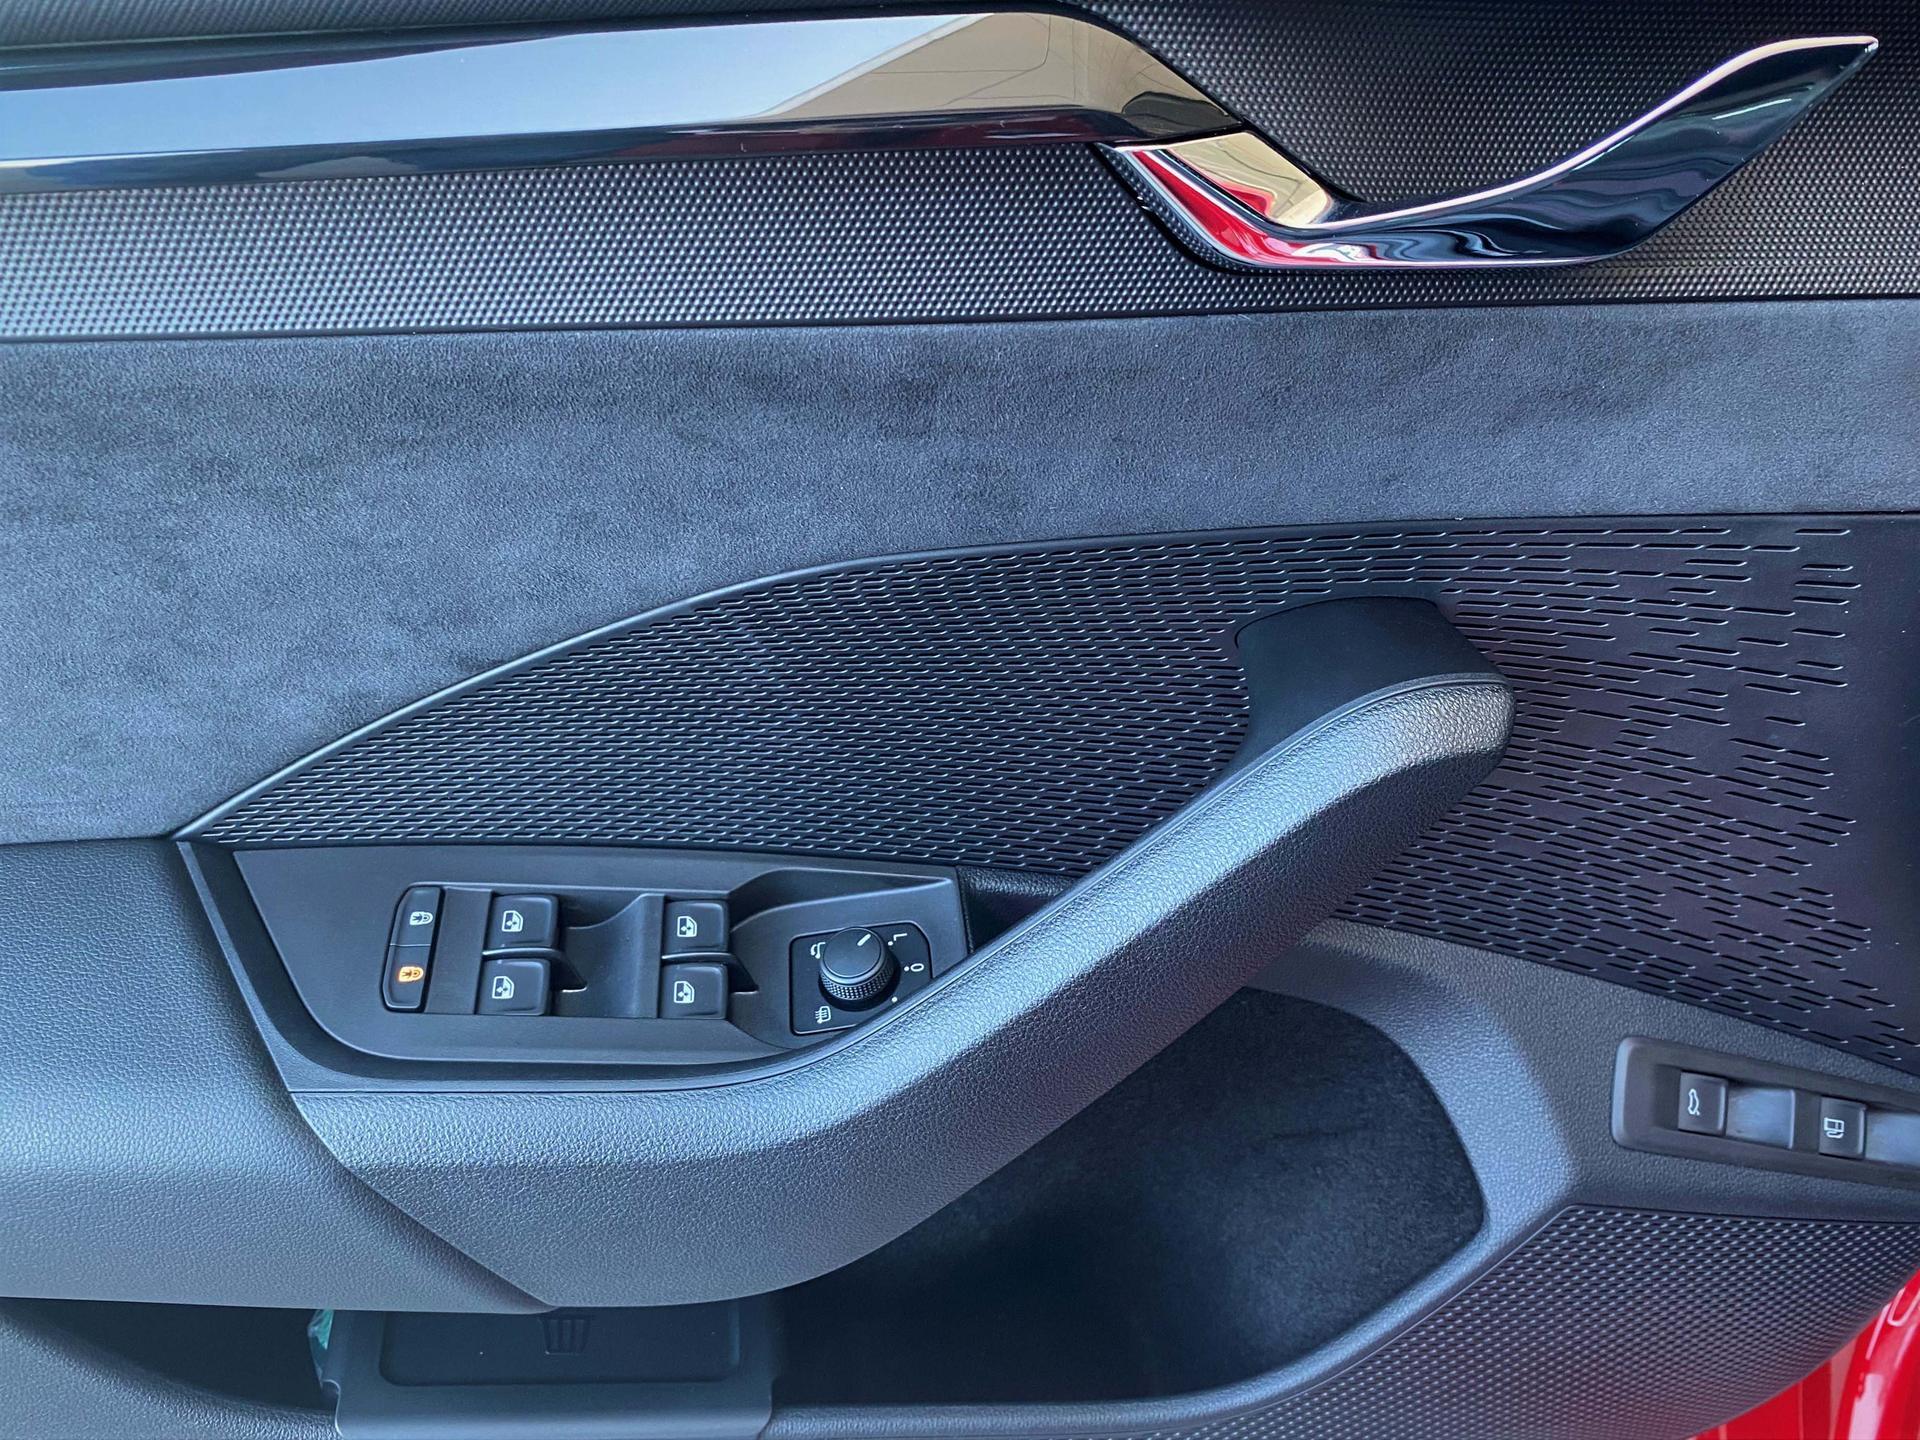 Fahrbericht SKODA Octavia RS iV (Plug-in-Hybrid im Test)